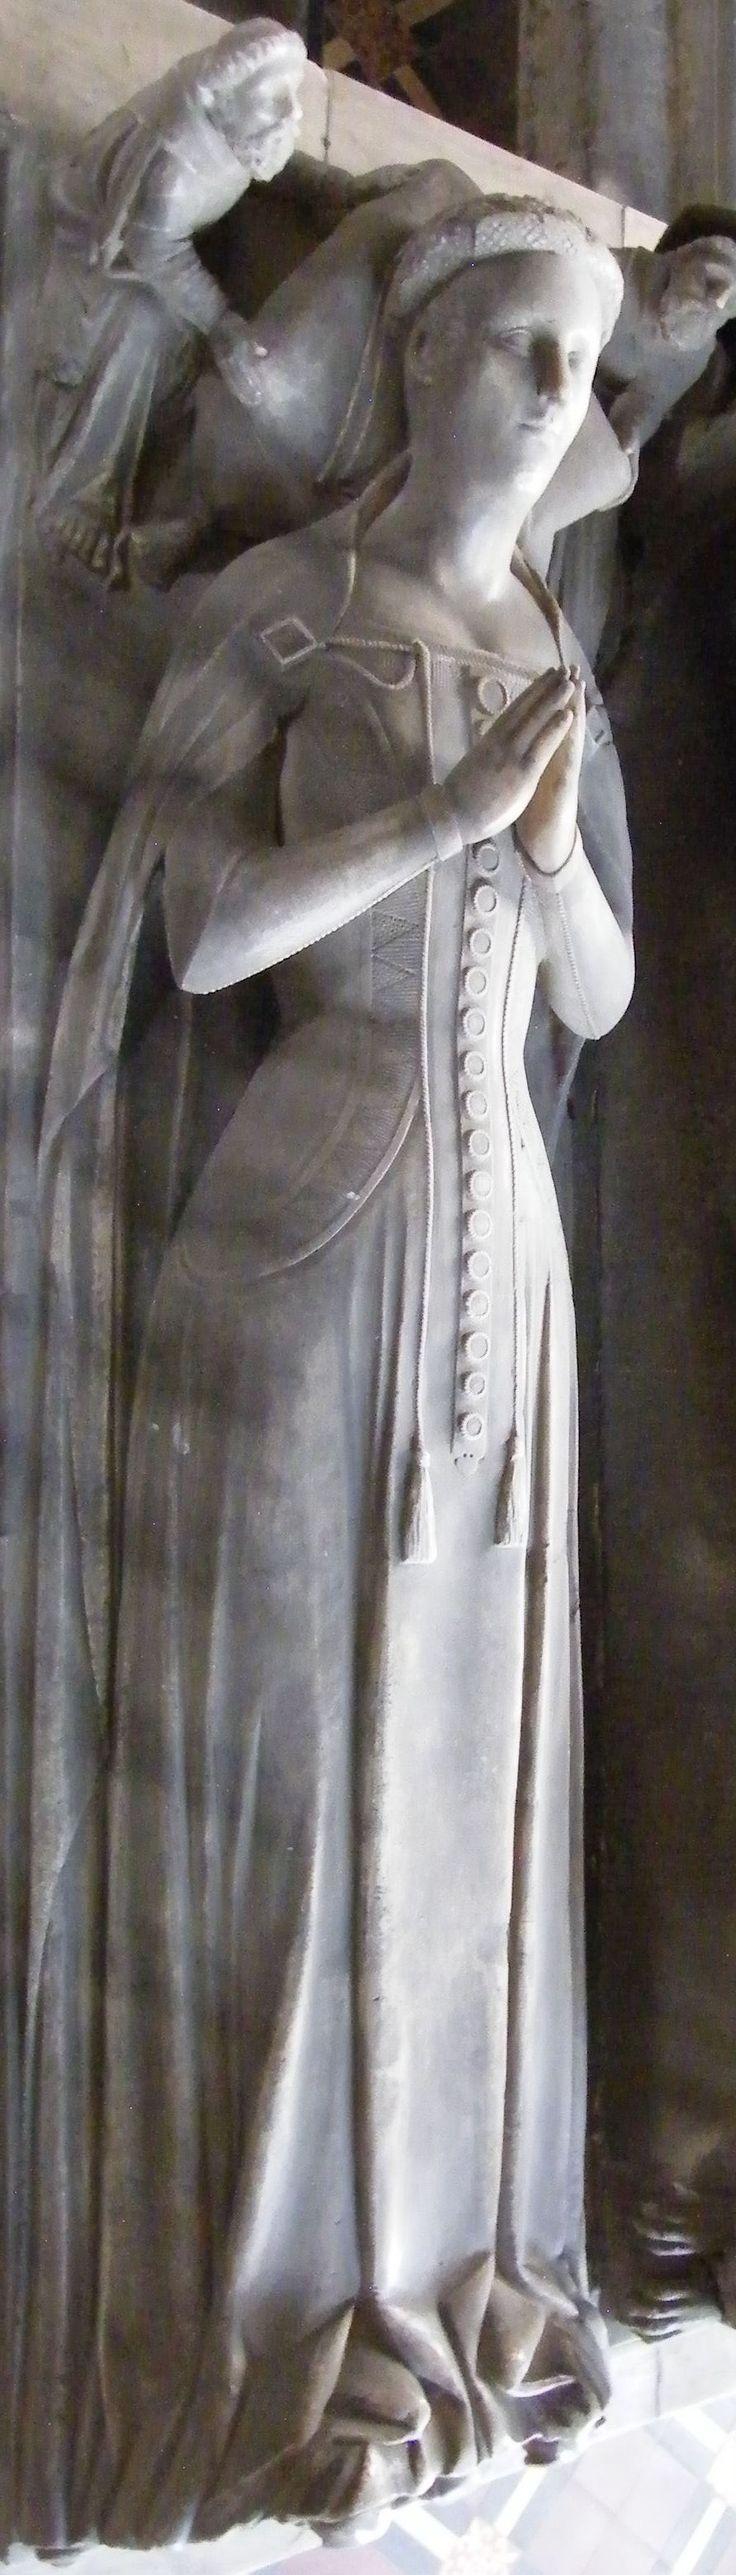 Elizabeth Latimer, 1395, Spilsby - St James http://www.themcs.org/costume/Female/Spilsby%20-%20St%20James%20Roger%20Willoughby%204th%20Baron%201396%20and%20Elizabeth%20Latimer%201395%20175.JPG